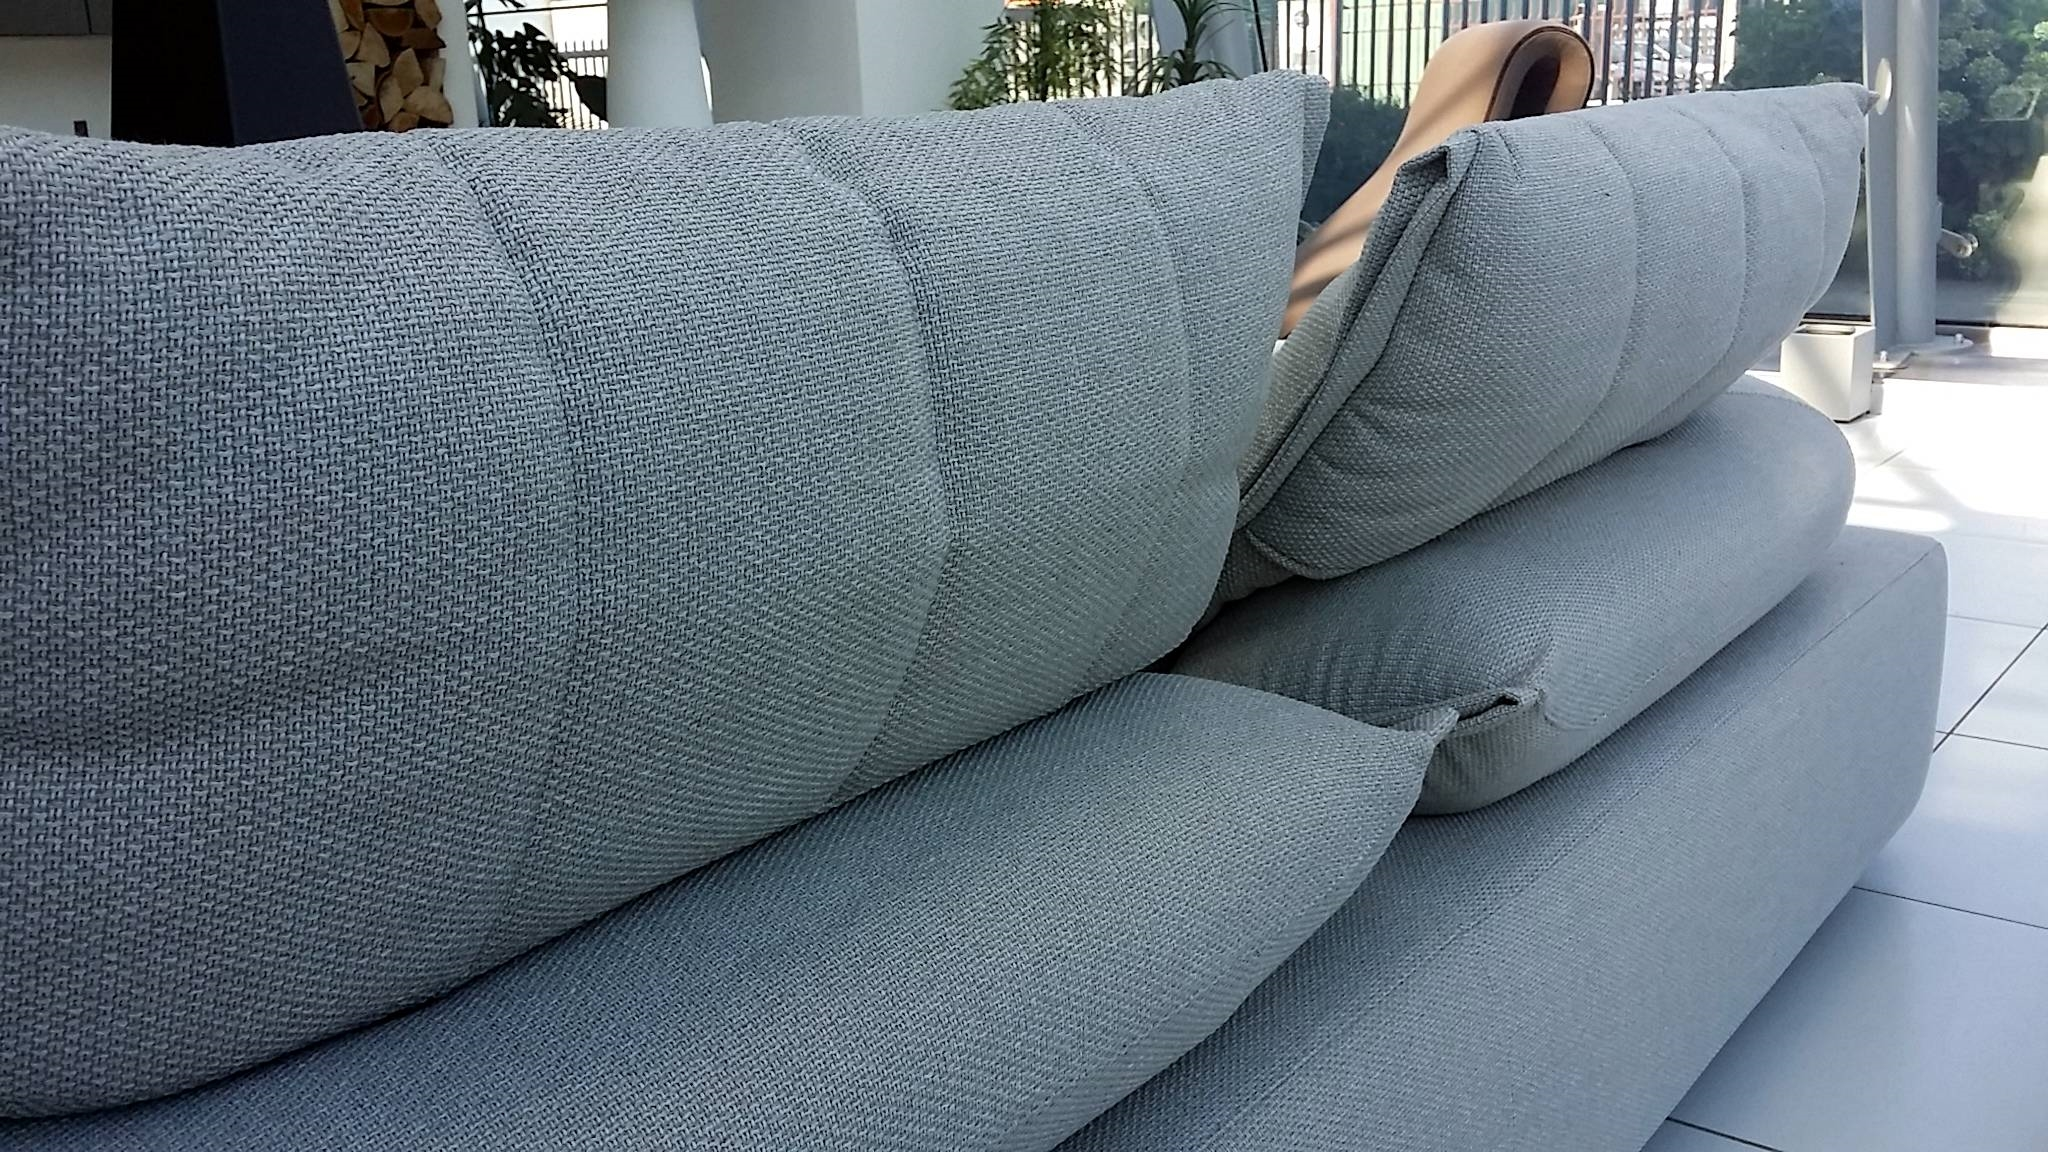 Outlet divano ditre italia flick flack divani a prezzi scontati - Outlet del divano assago ...